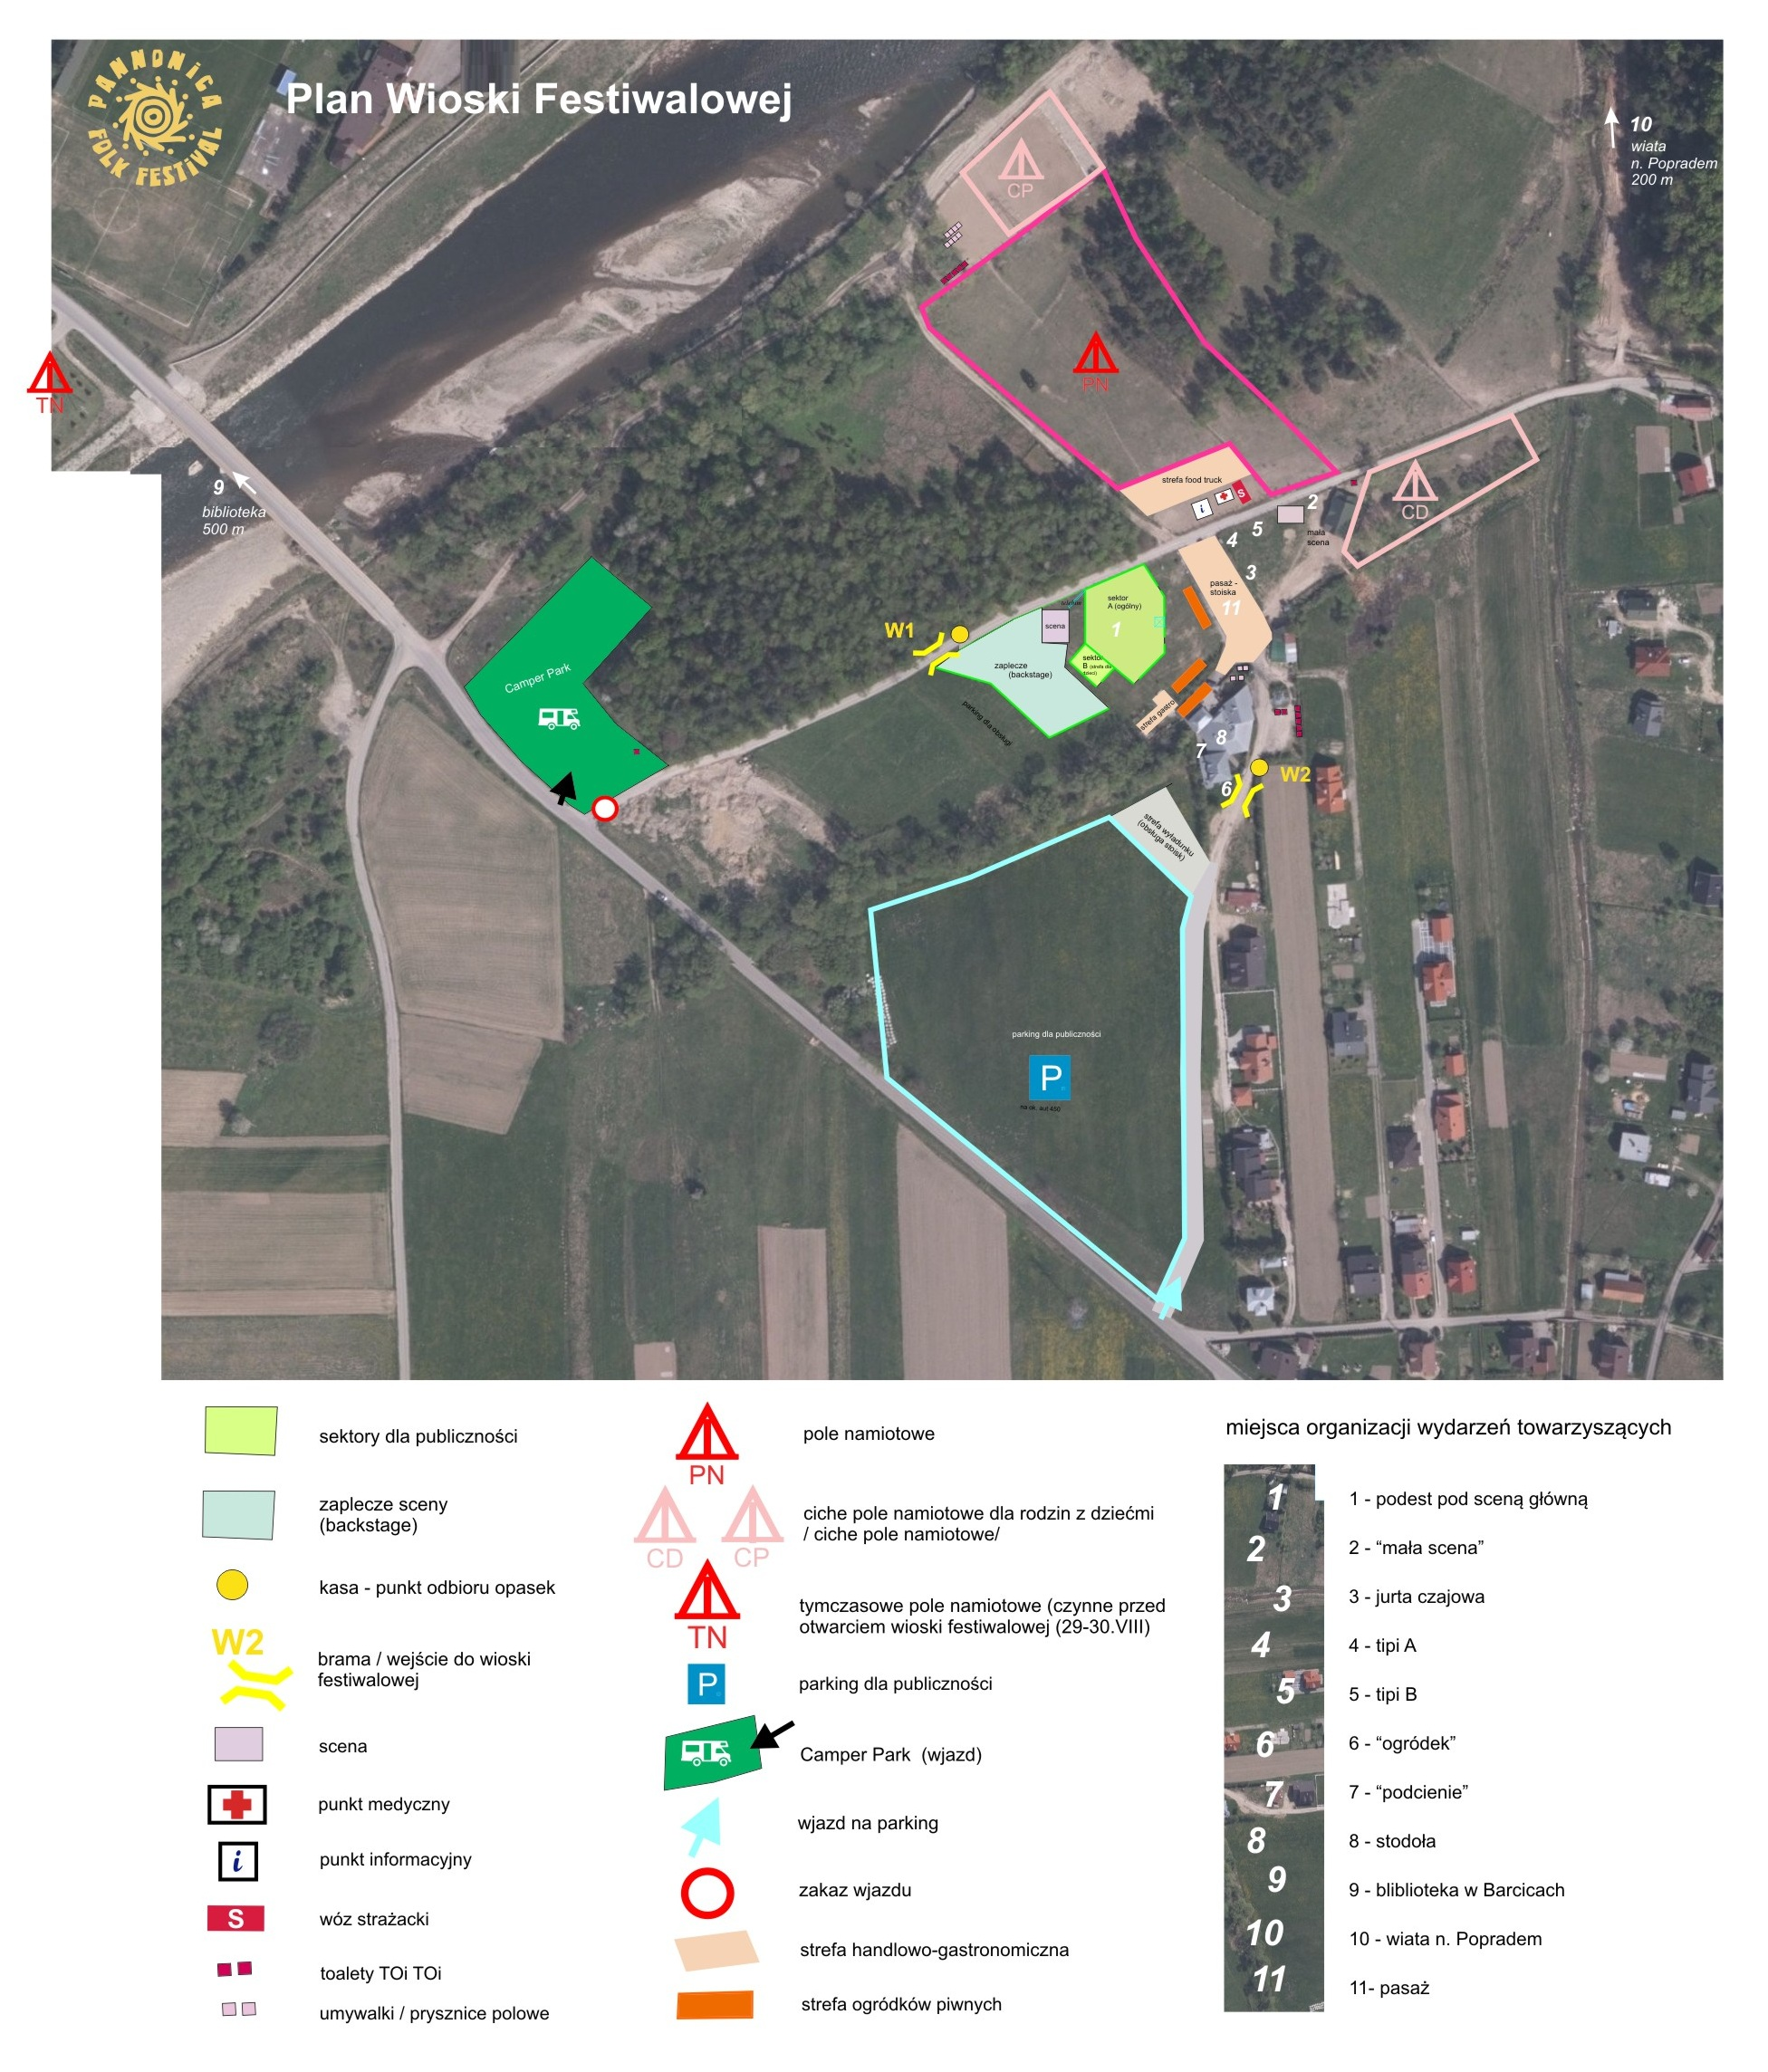 plan wioski festiwalowej8a